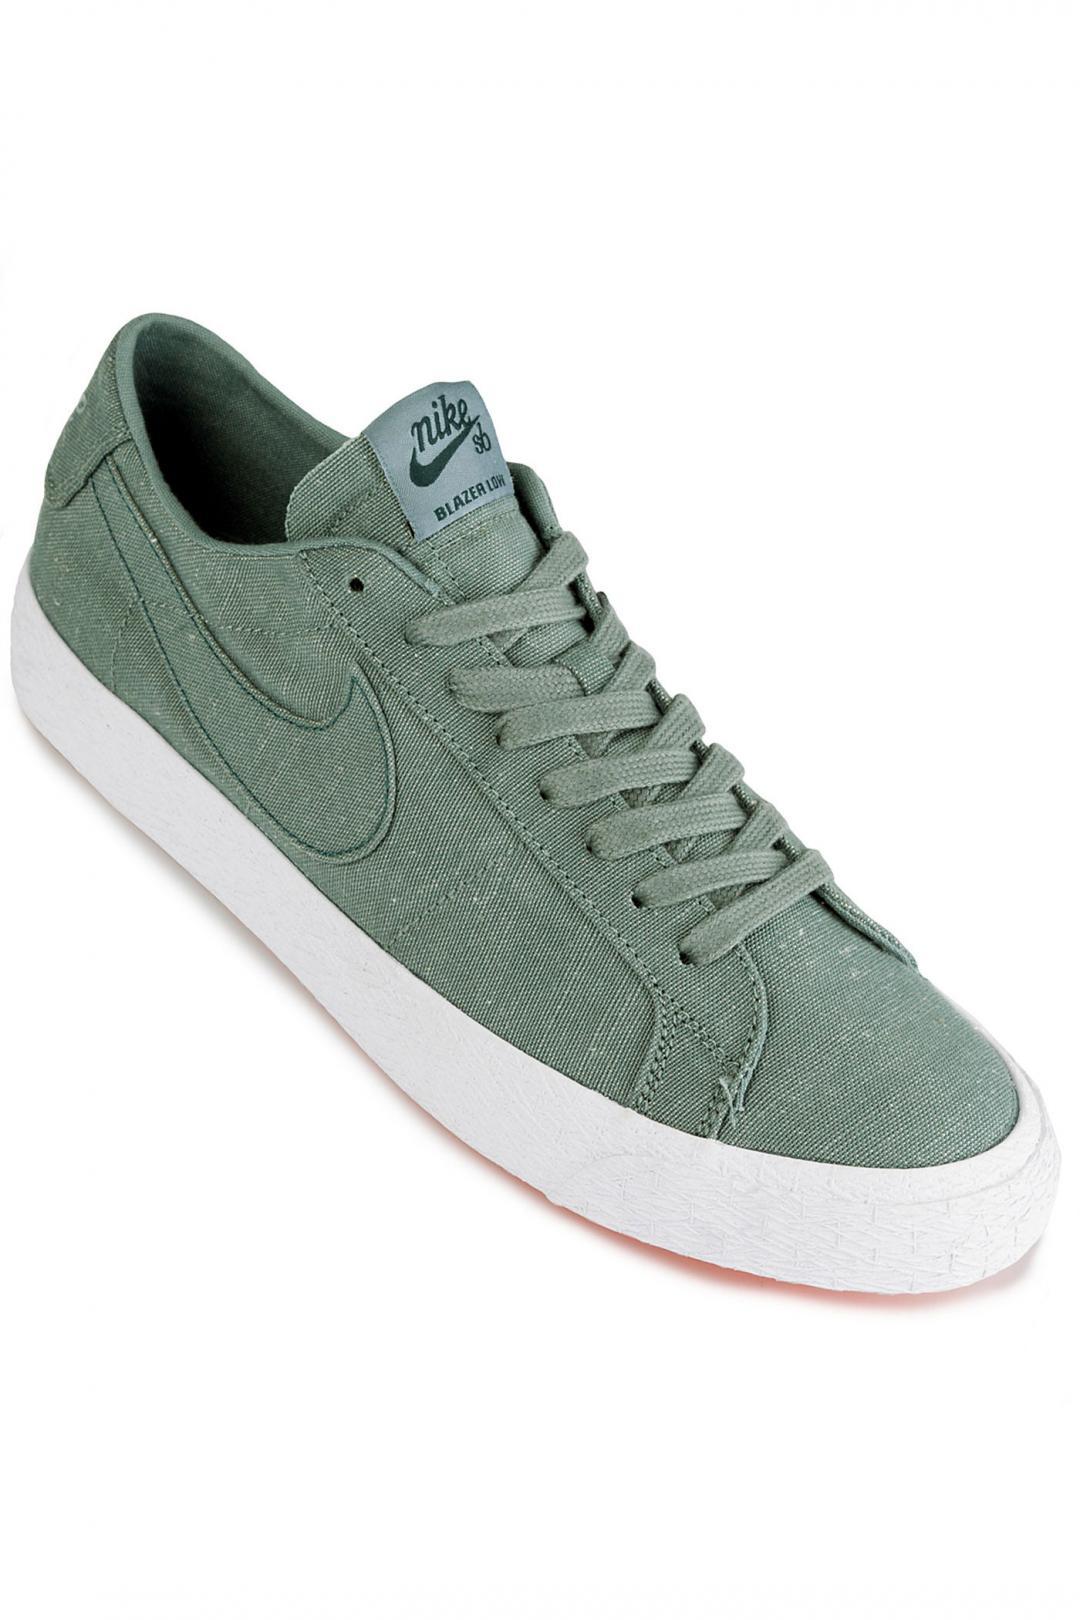 Uomo Nike SB Zoom Blazer Low Canvas Deconstructed clay green | Sneaker